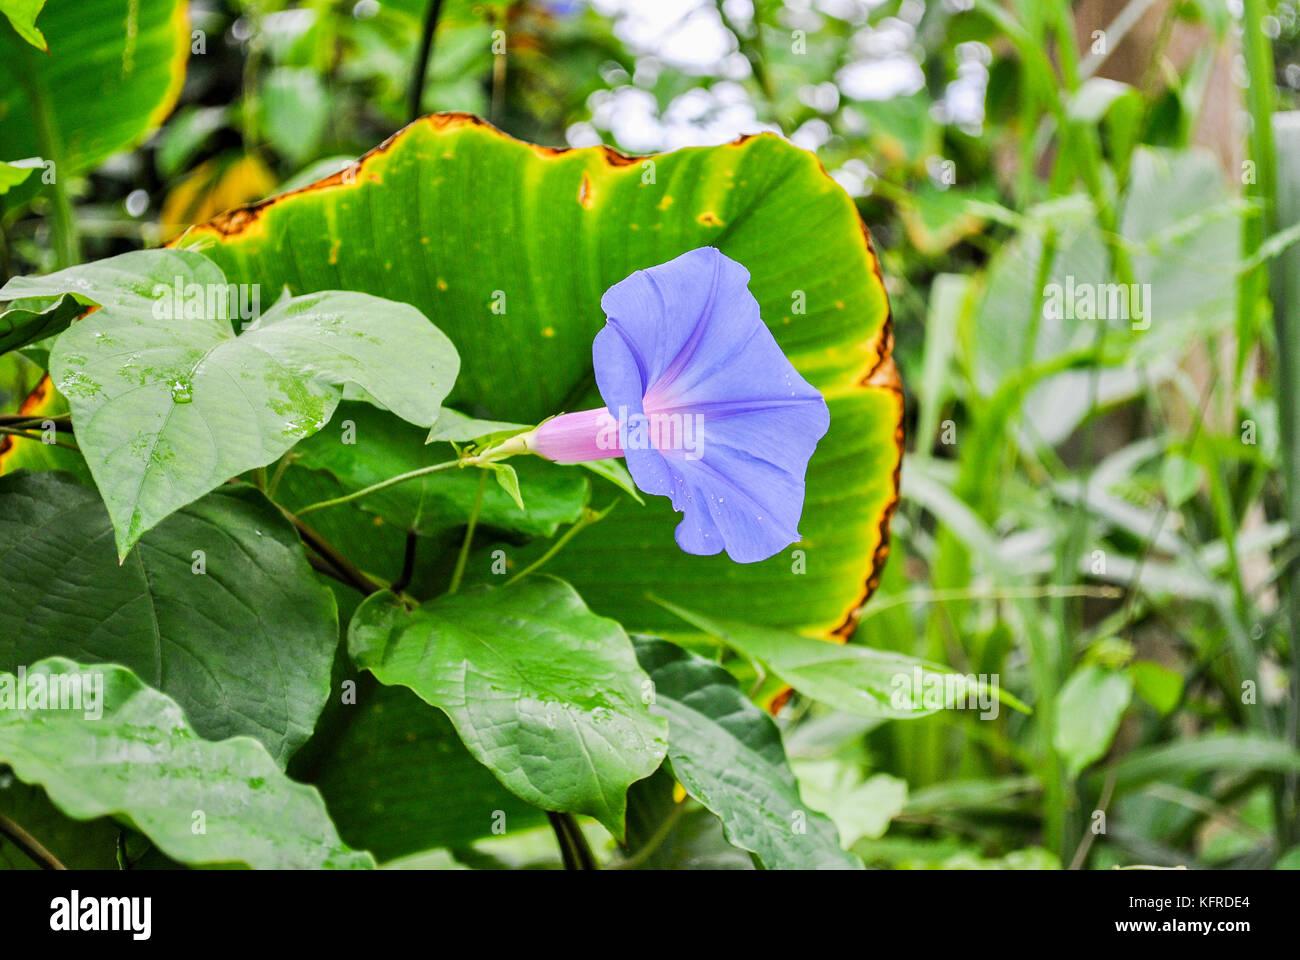 Ipomoea acuminata stock photos ipomoea acuminata stock images alamy blue dawn flower ipomoea acuminata stock image izmirmasajfo Choice Image